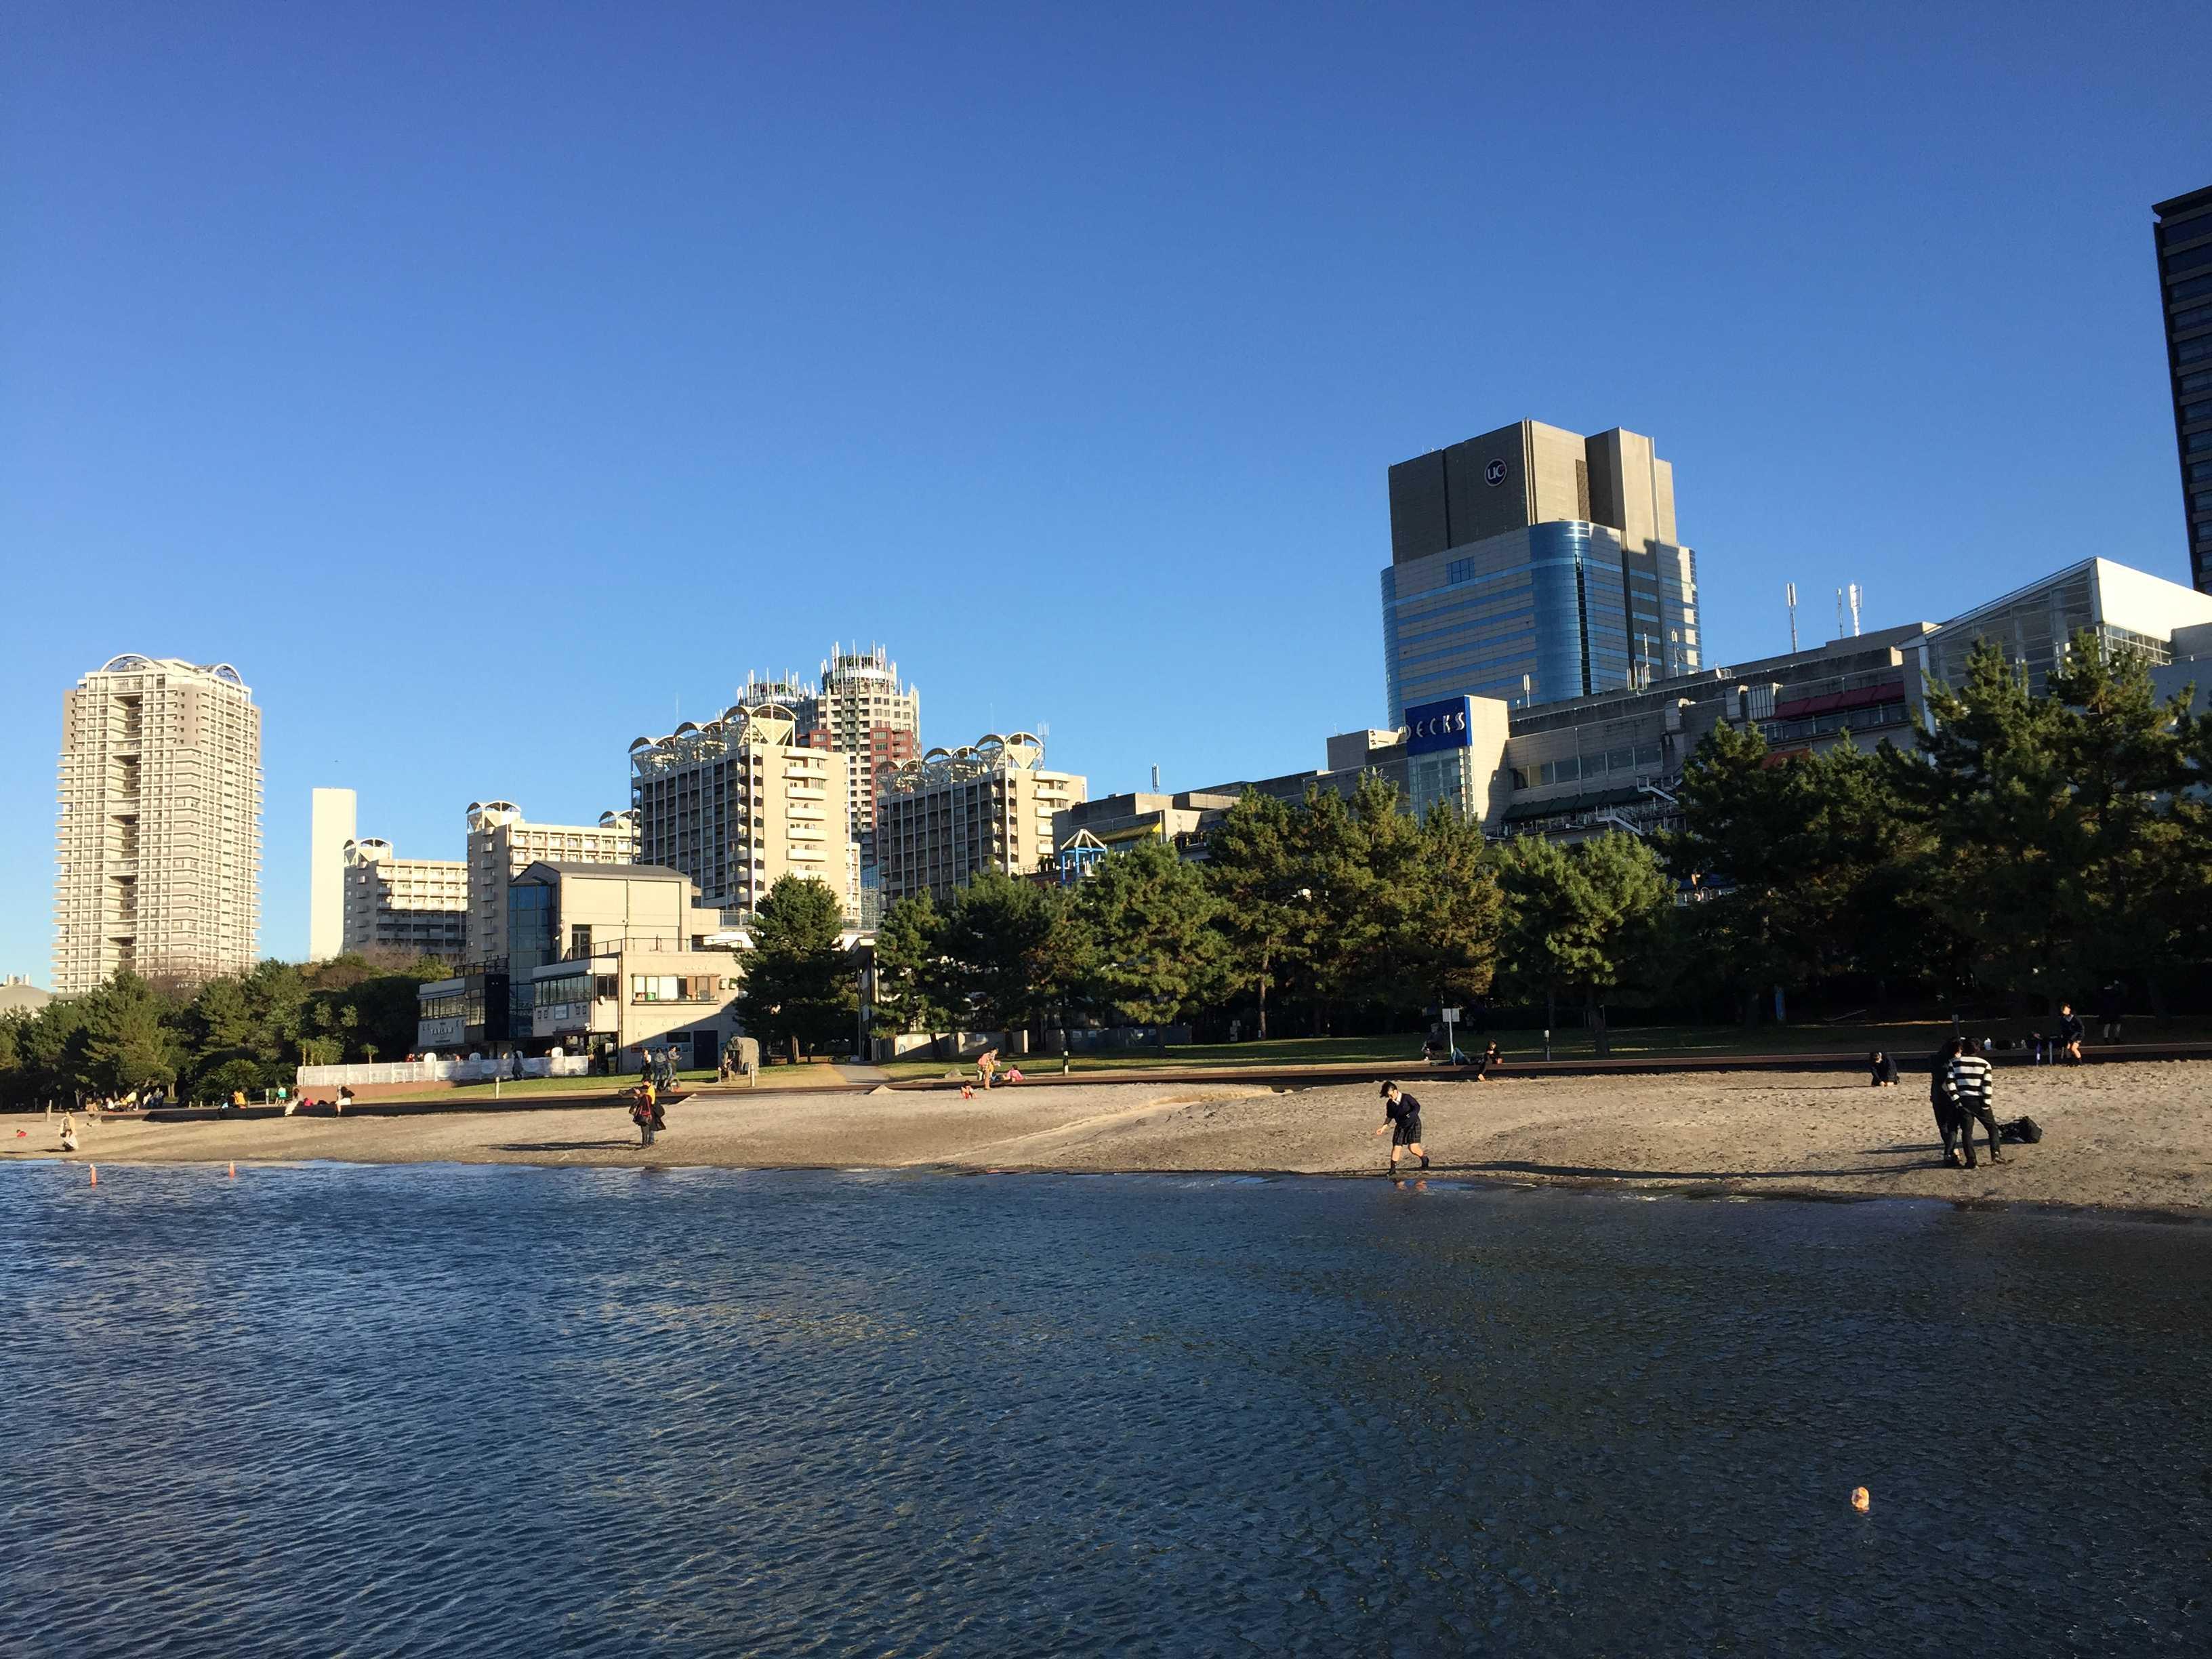 砂浜 - お台場海浜公園